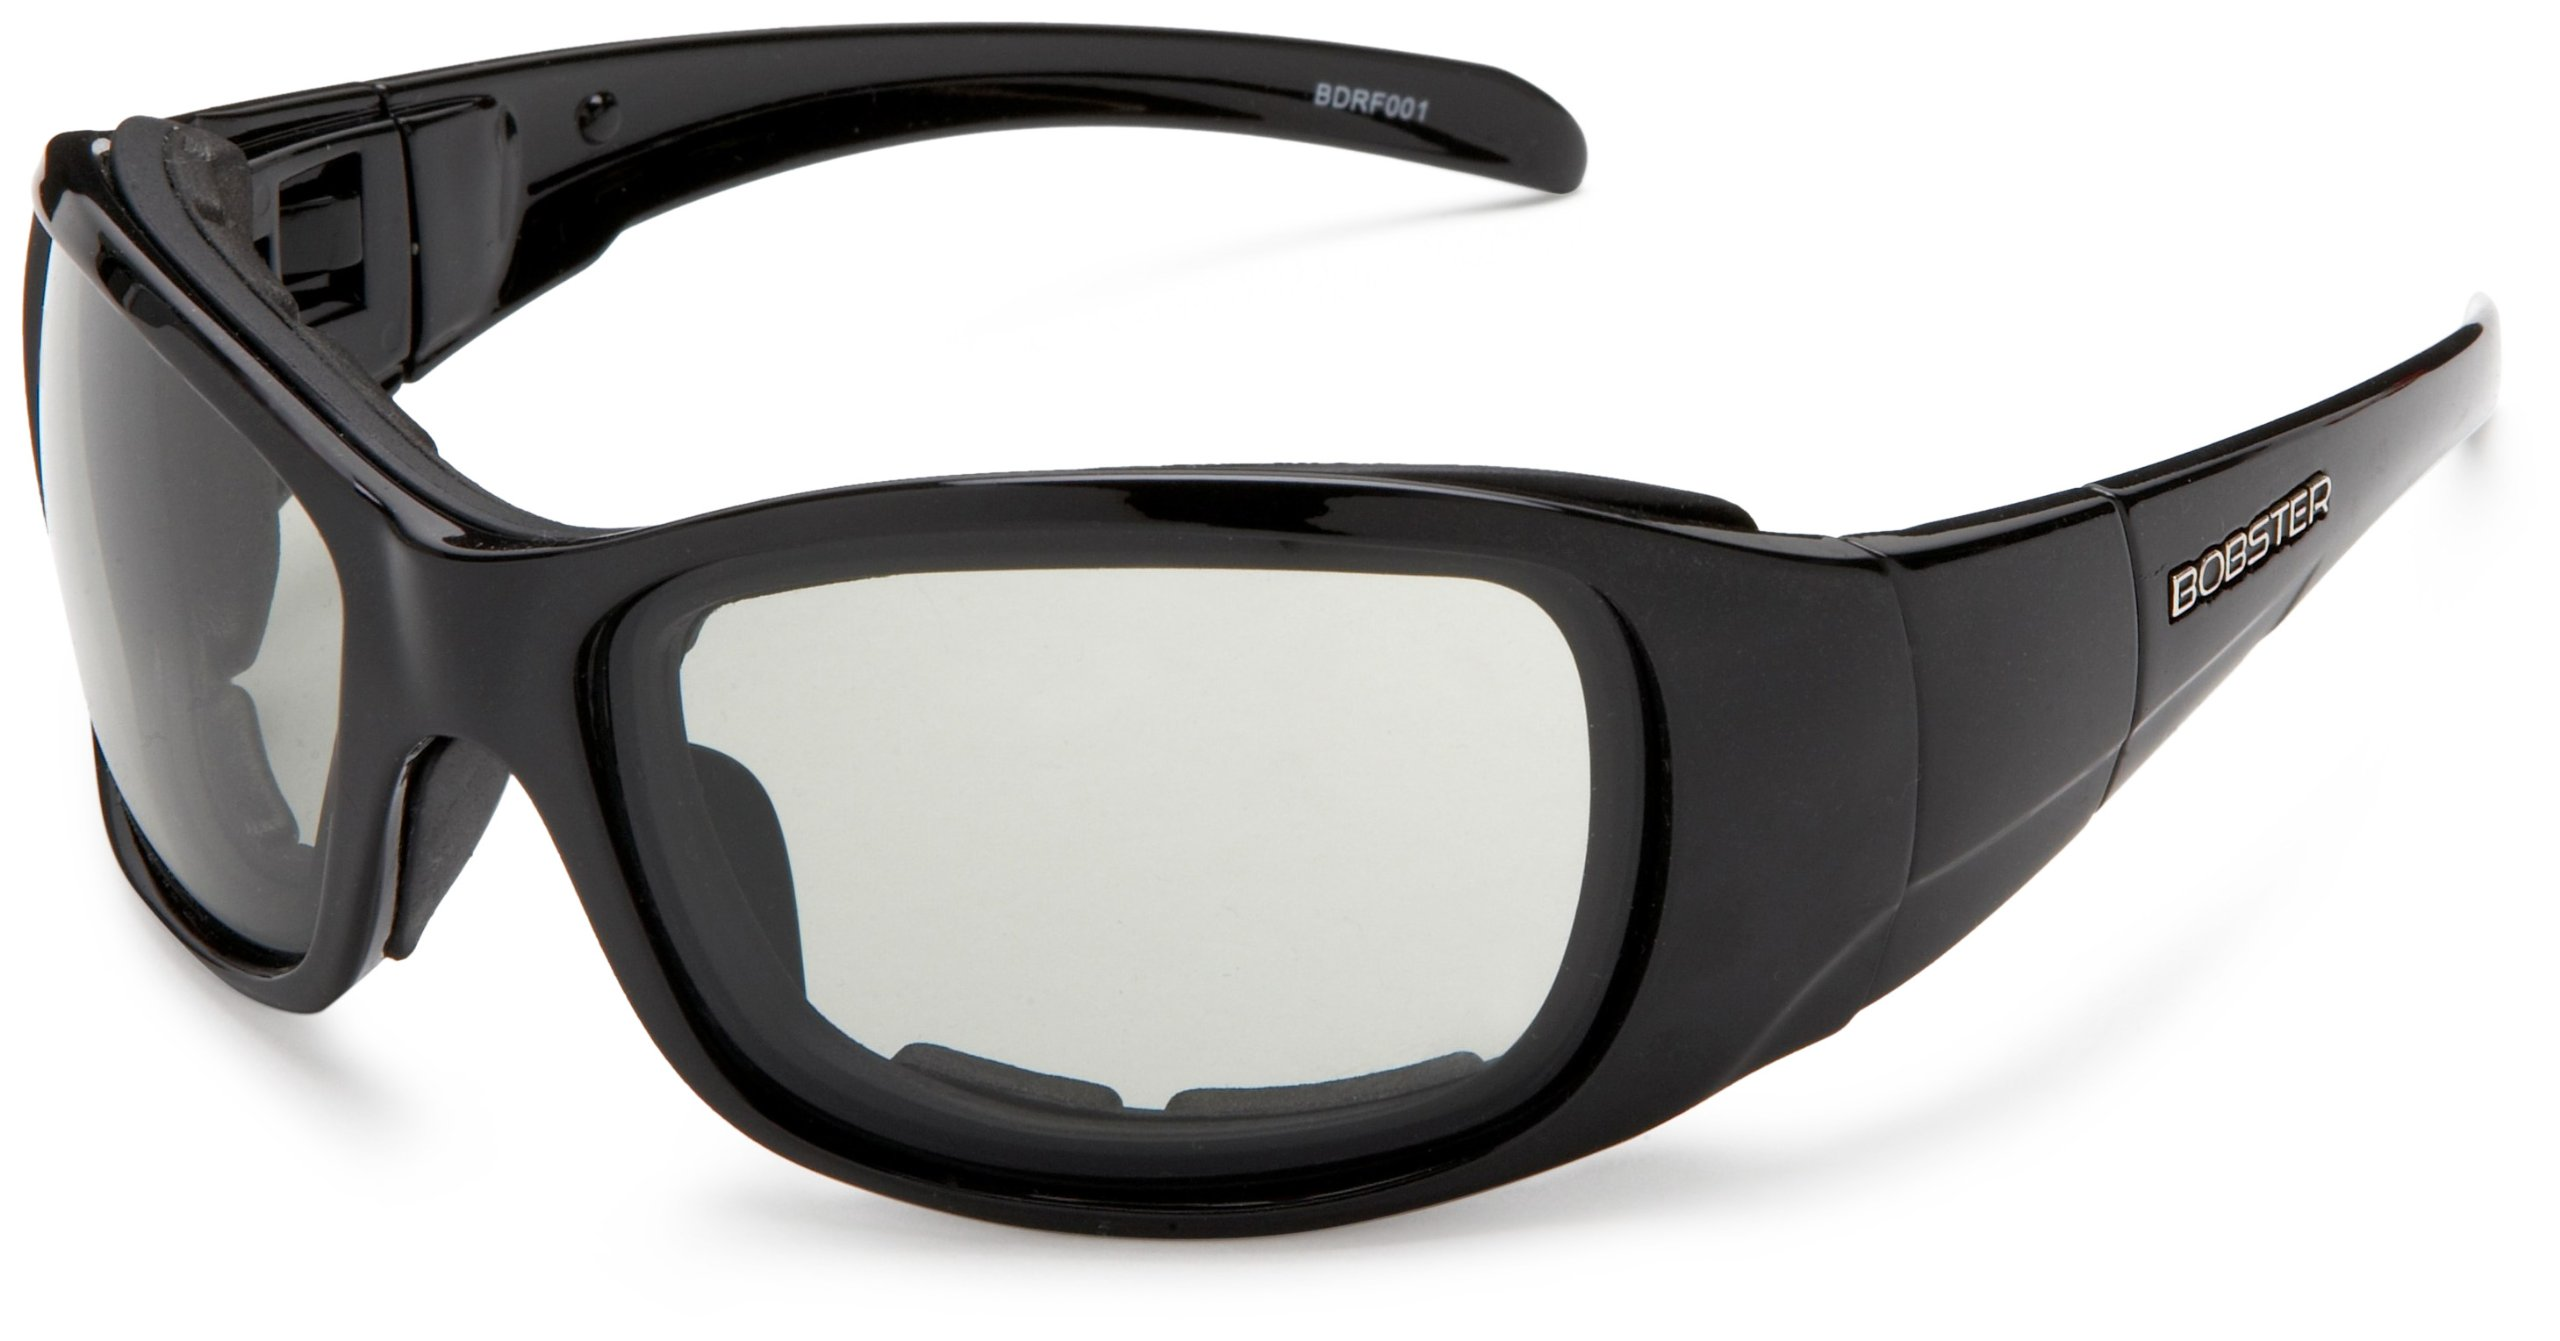 Bobster Drifter Oversized Sunglasses,Black Frame/Photochromic and Clear Lens,one size